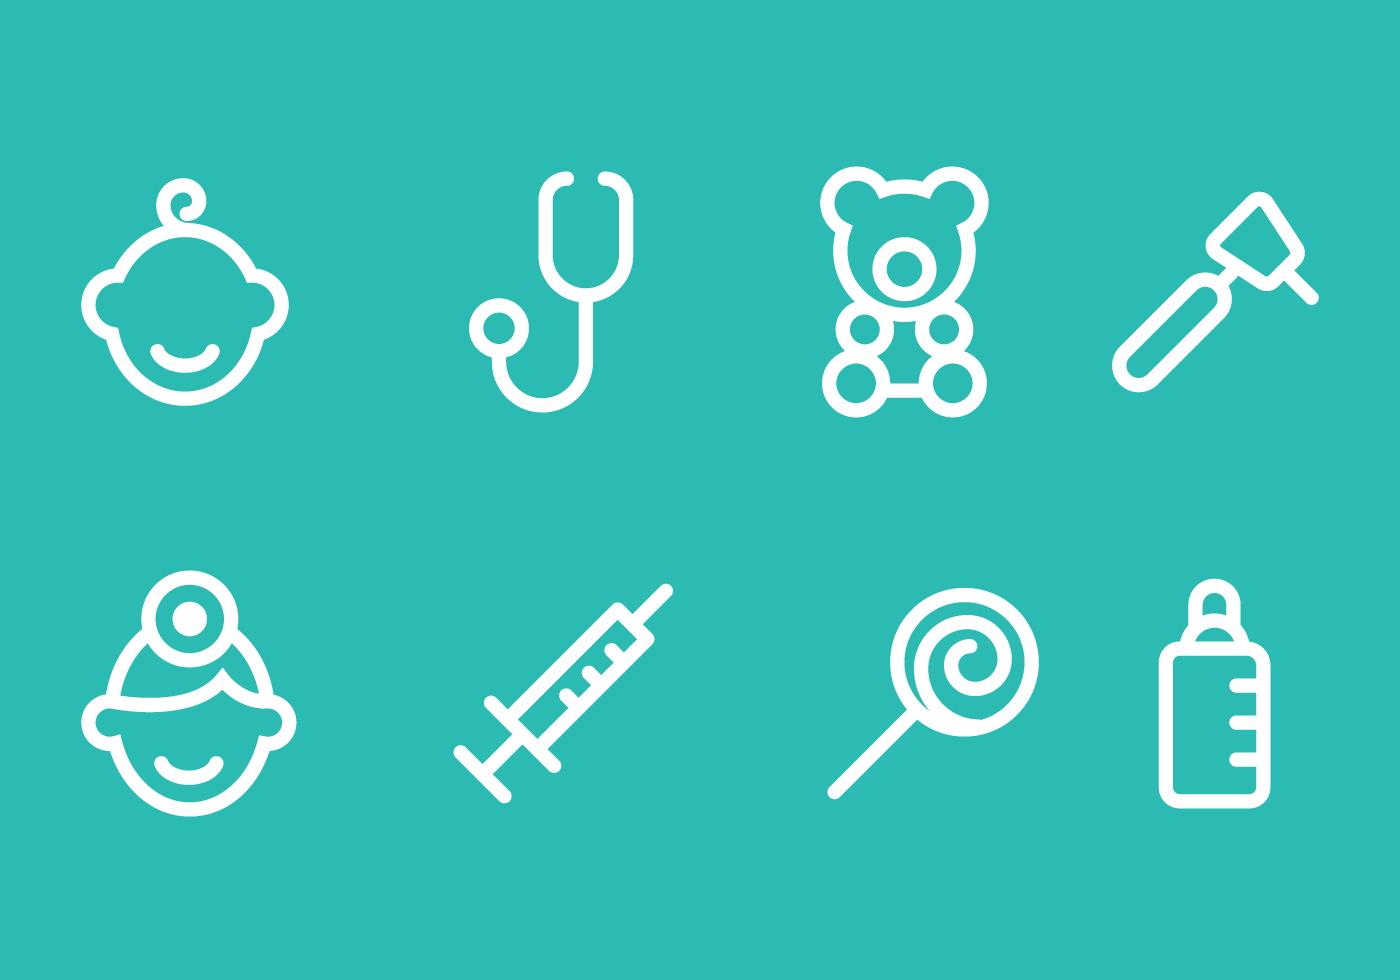 Pediatrician Icon Vector - Download Free Vectors, Clipart ...